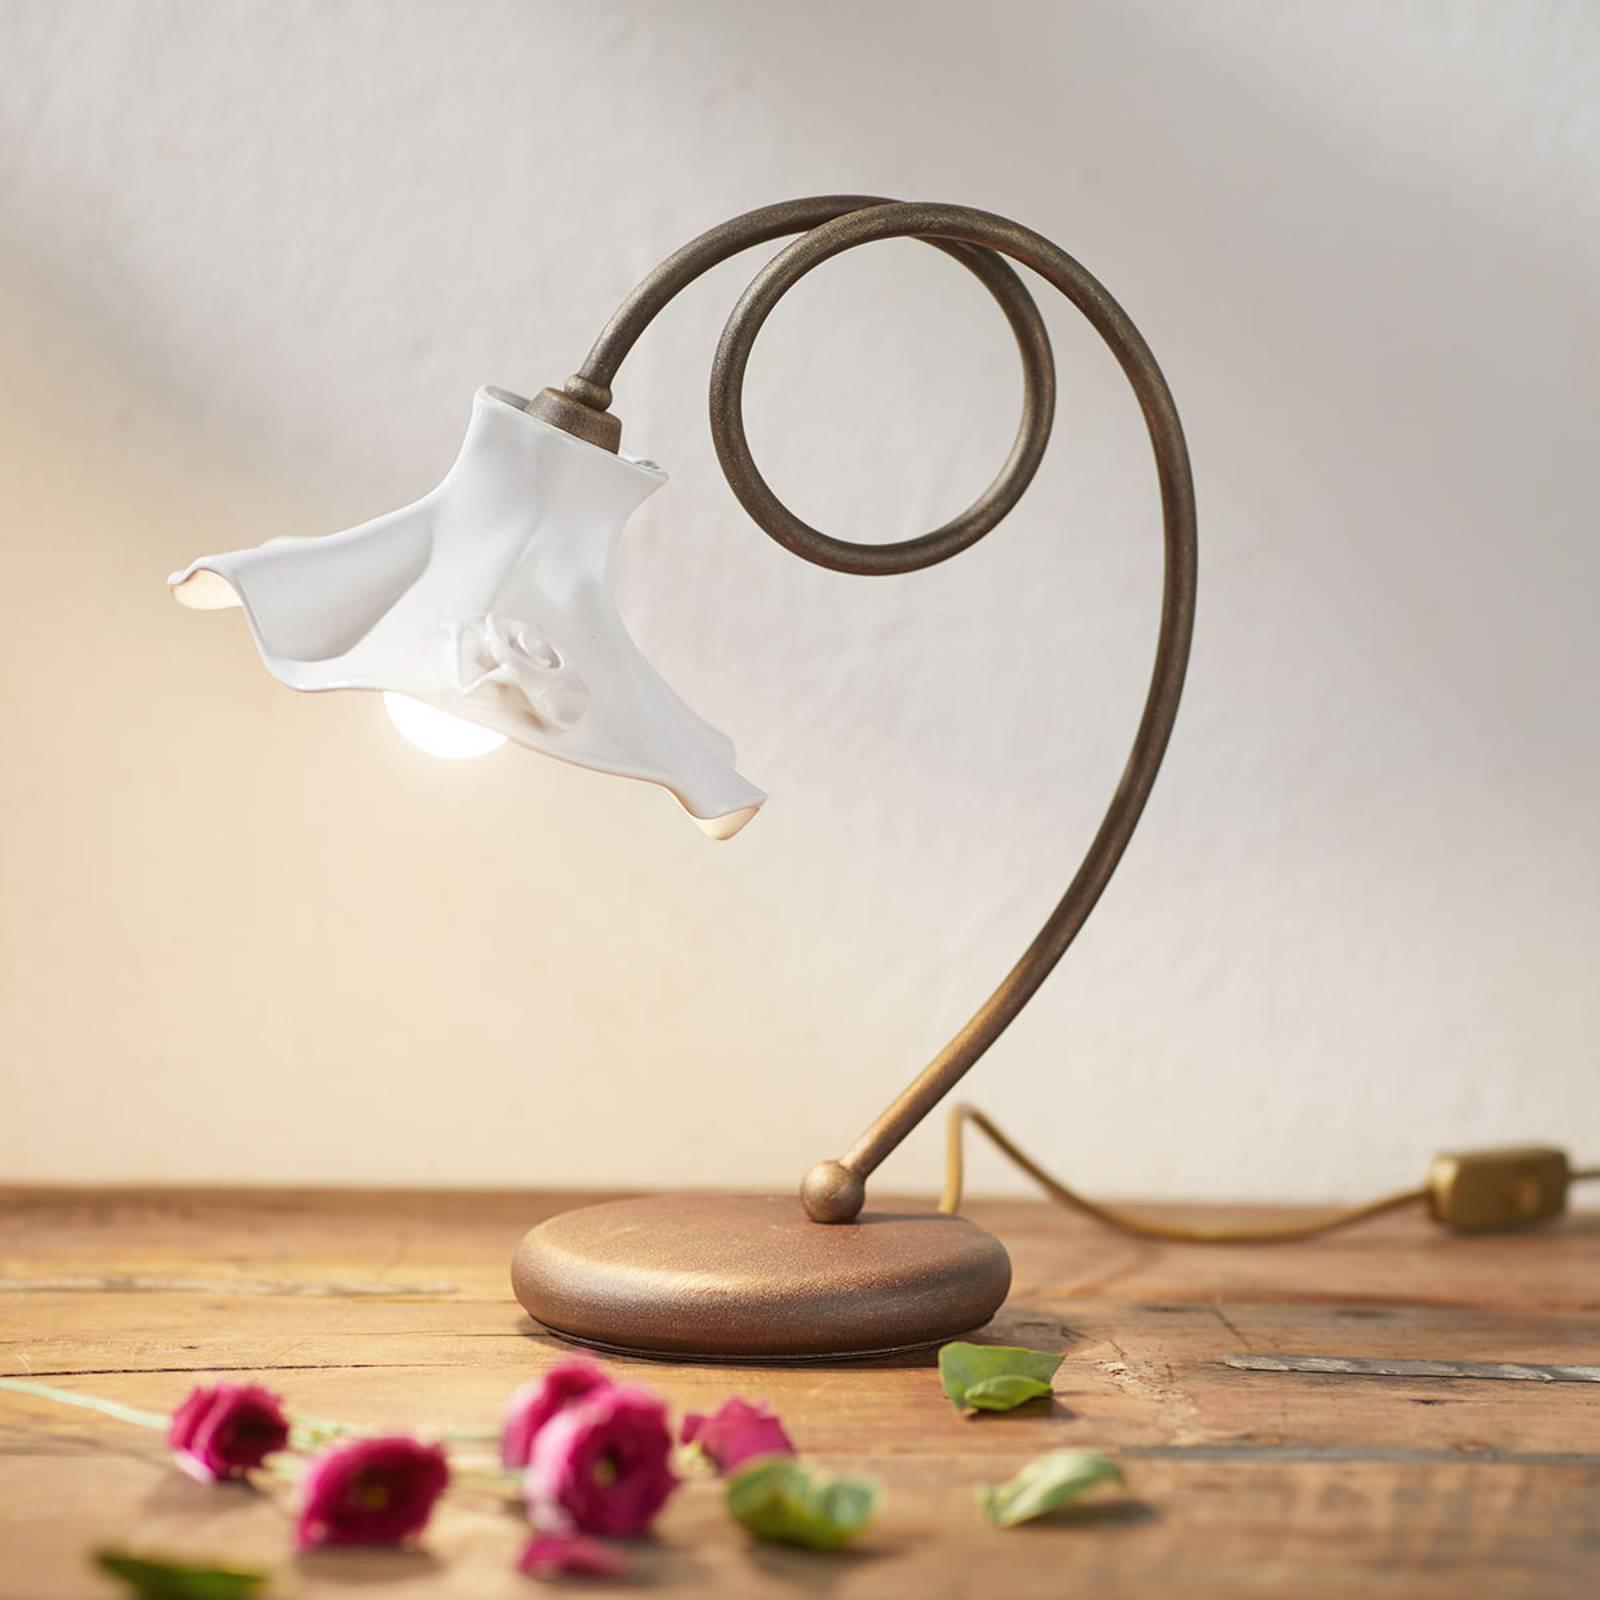 Tiltalende Eleonora bordlampe